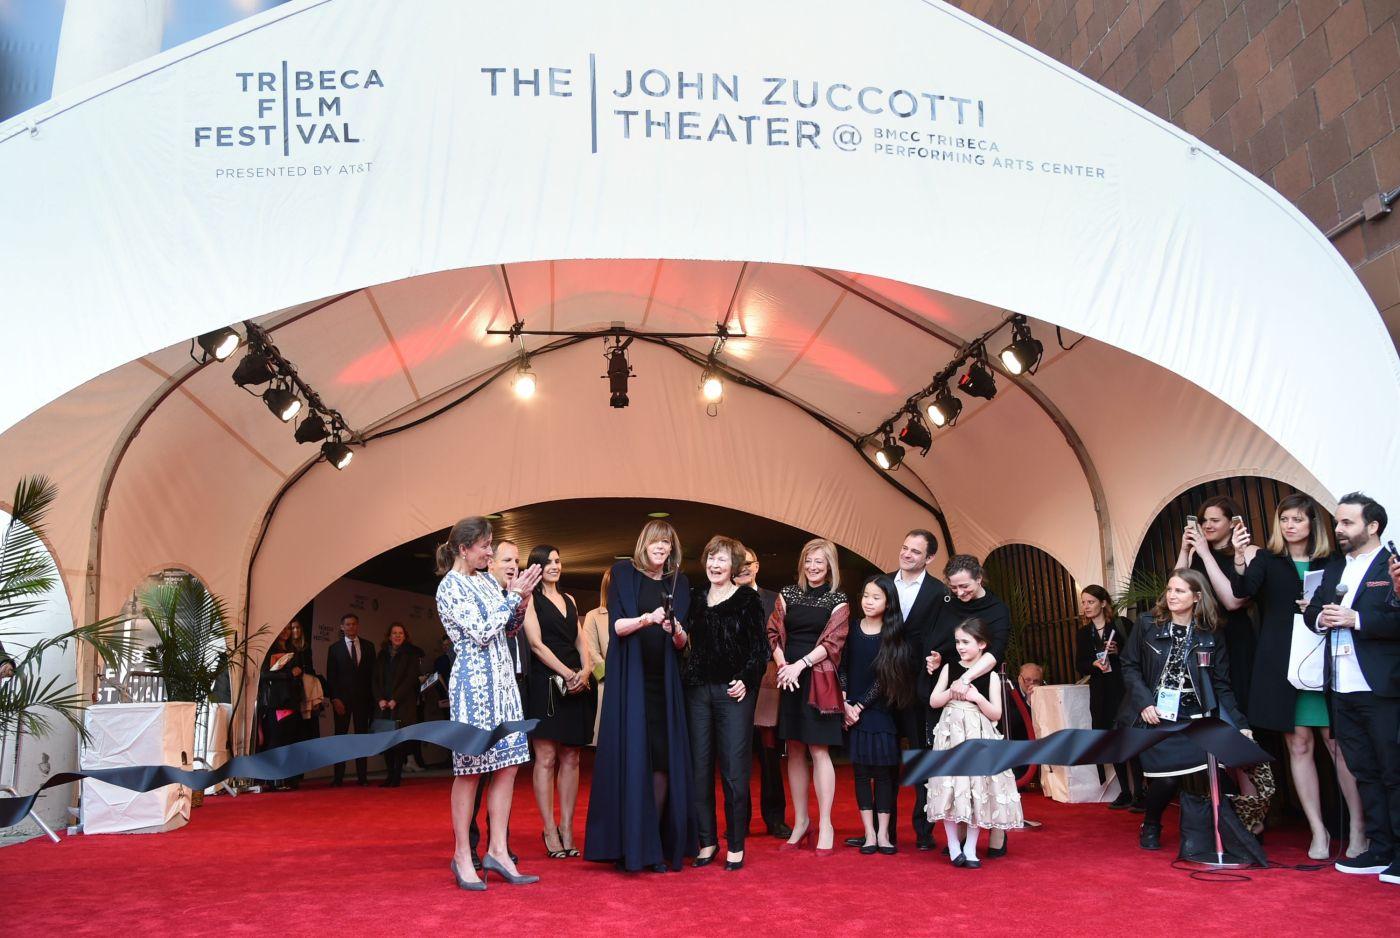 Tribeca Film Festival: James Murdoch Buys Controlling Stake ...